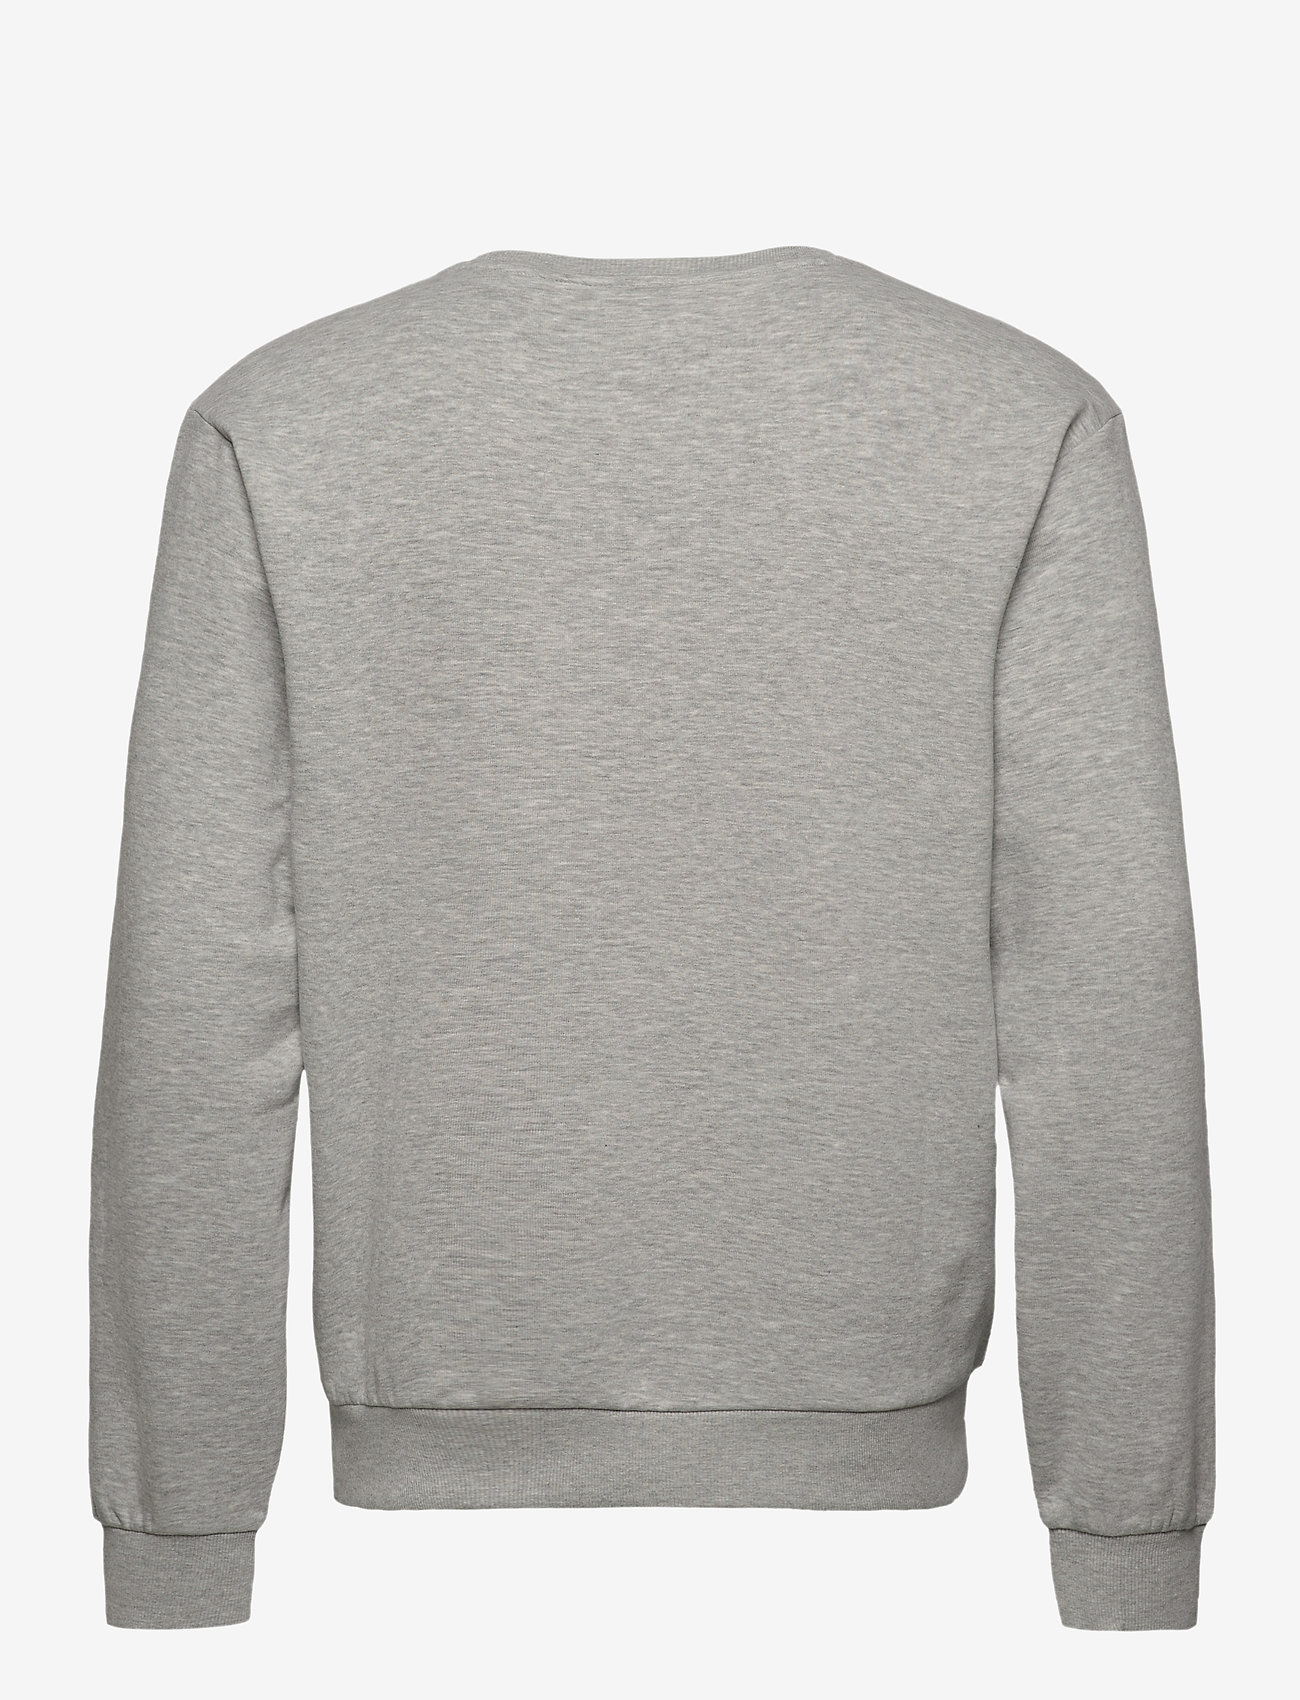 FILA MEN EFIM crew sweat - Sweatshirts LIGHT GREY MELANGE BROS - Menn Klær